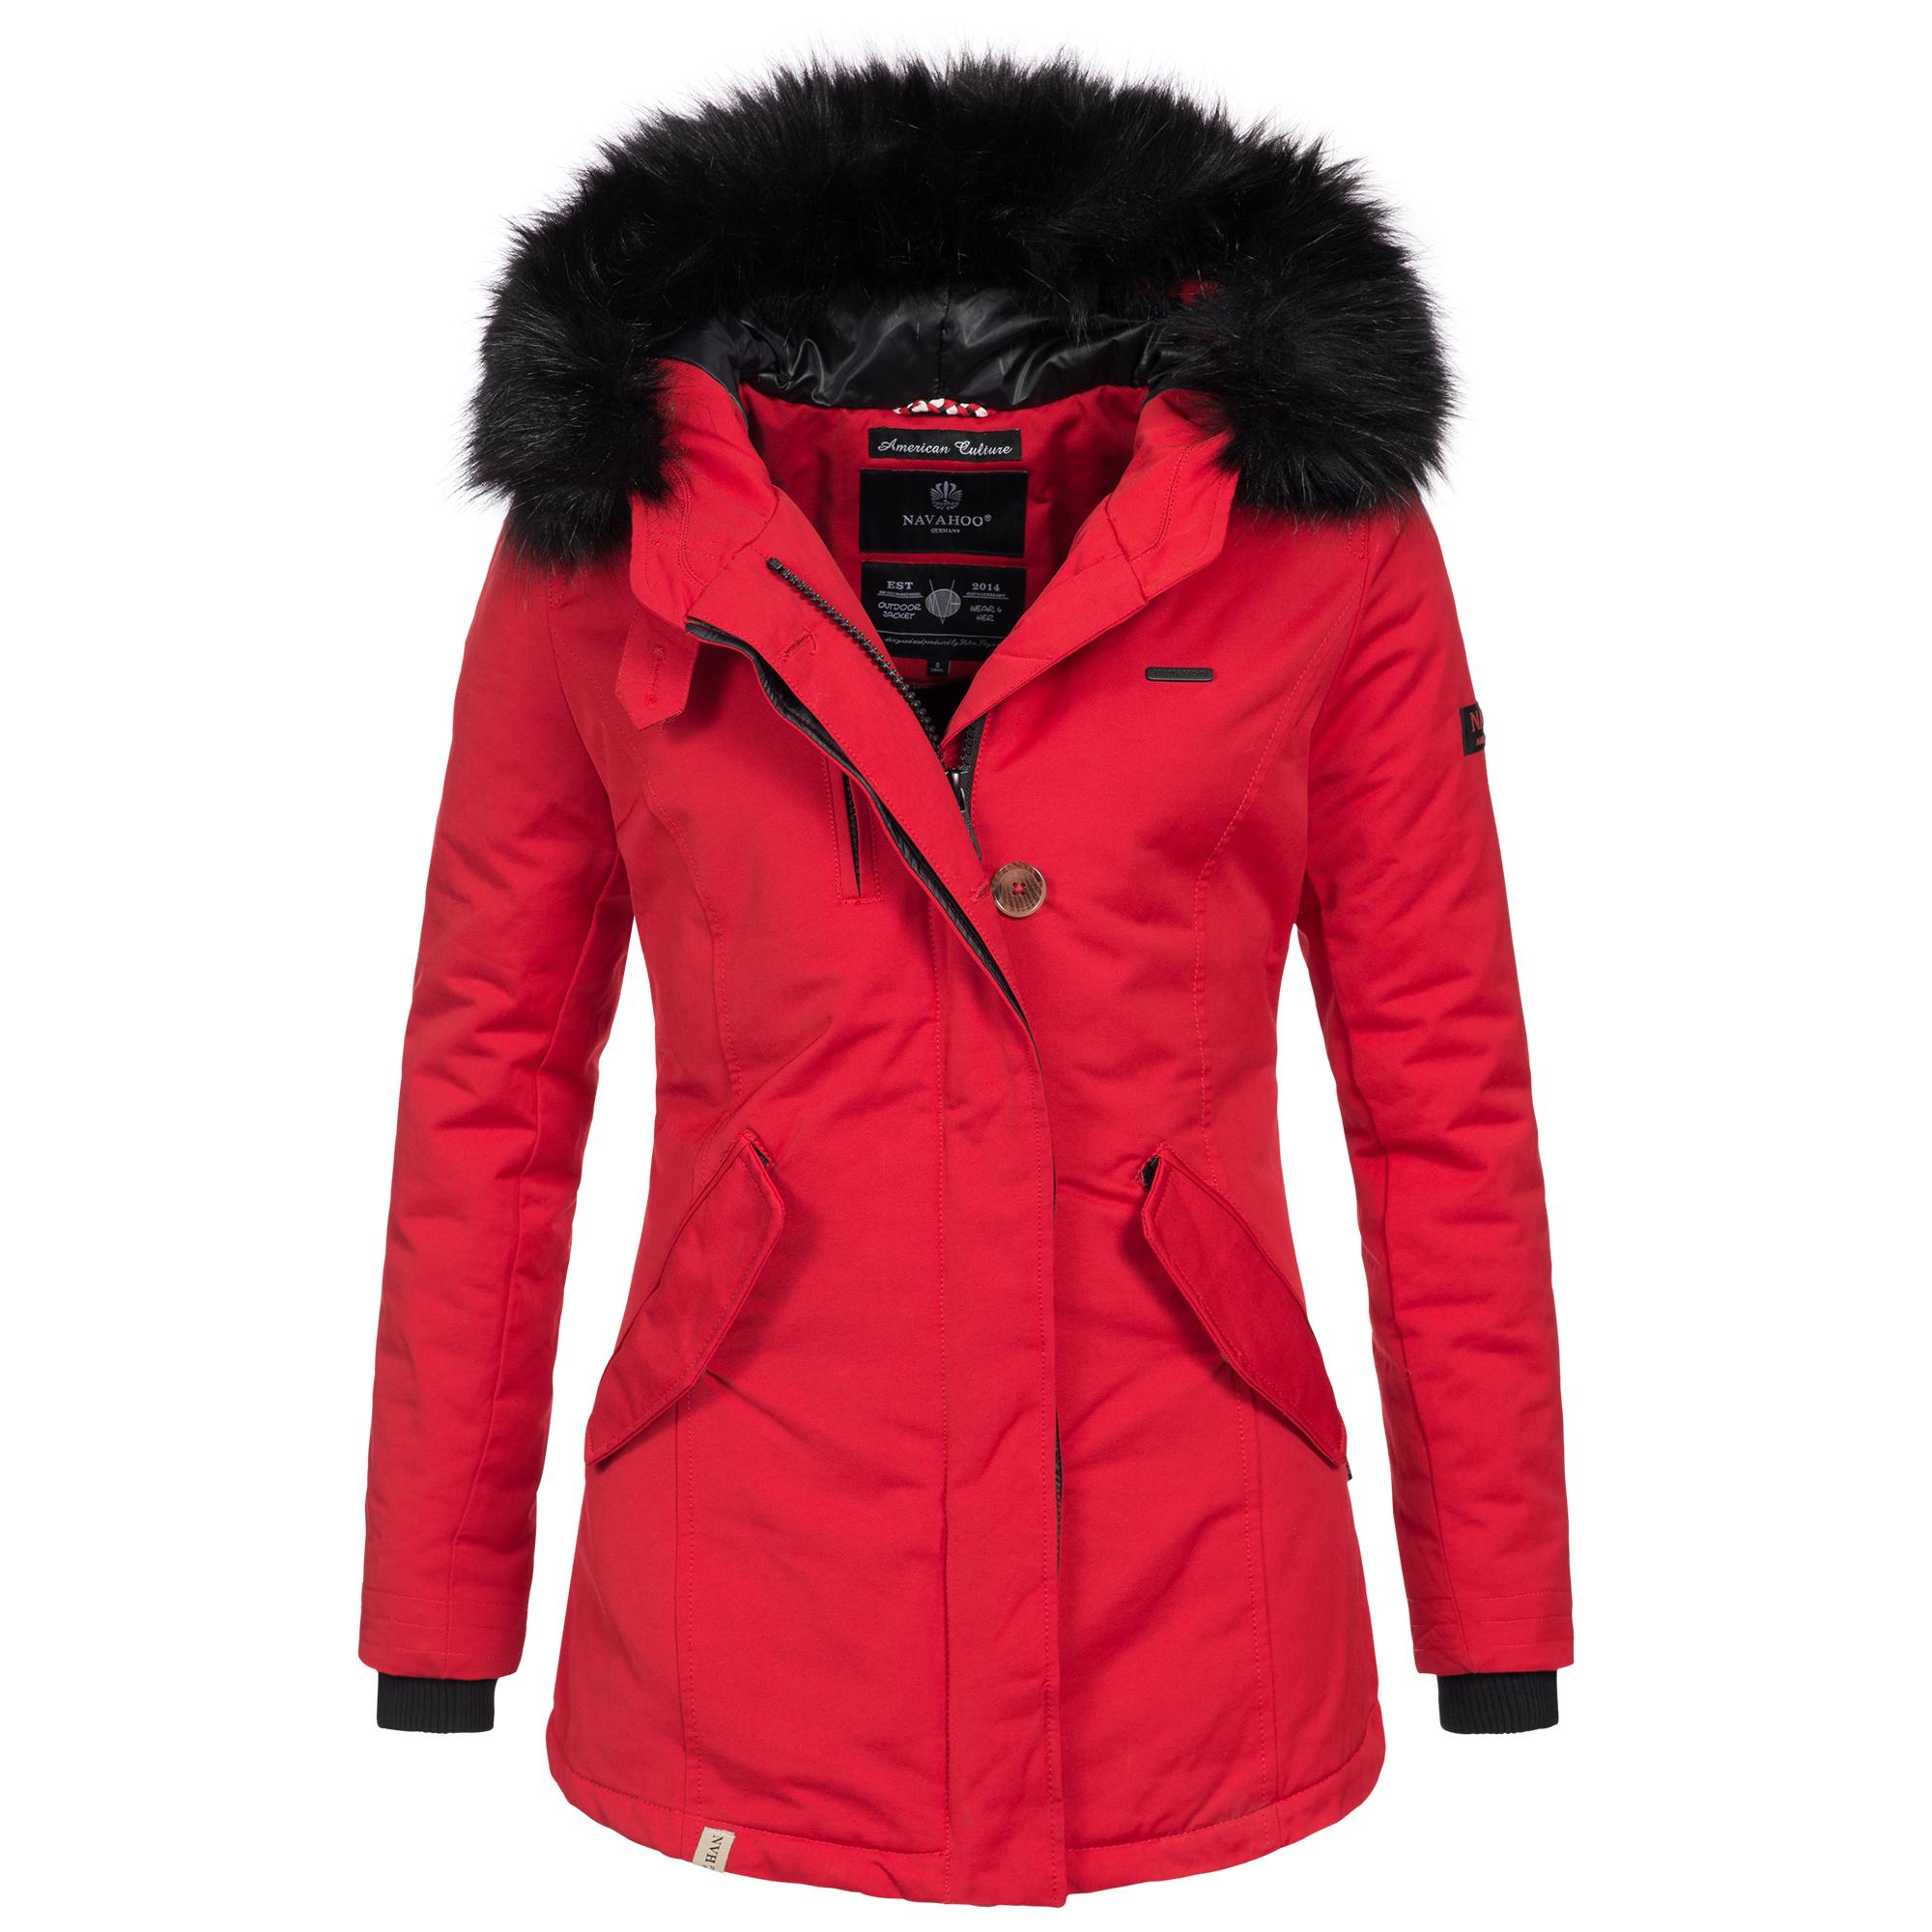 Damen Nisam Farben Luxus Mantel Winterjacke Navahoo Warm